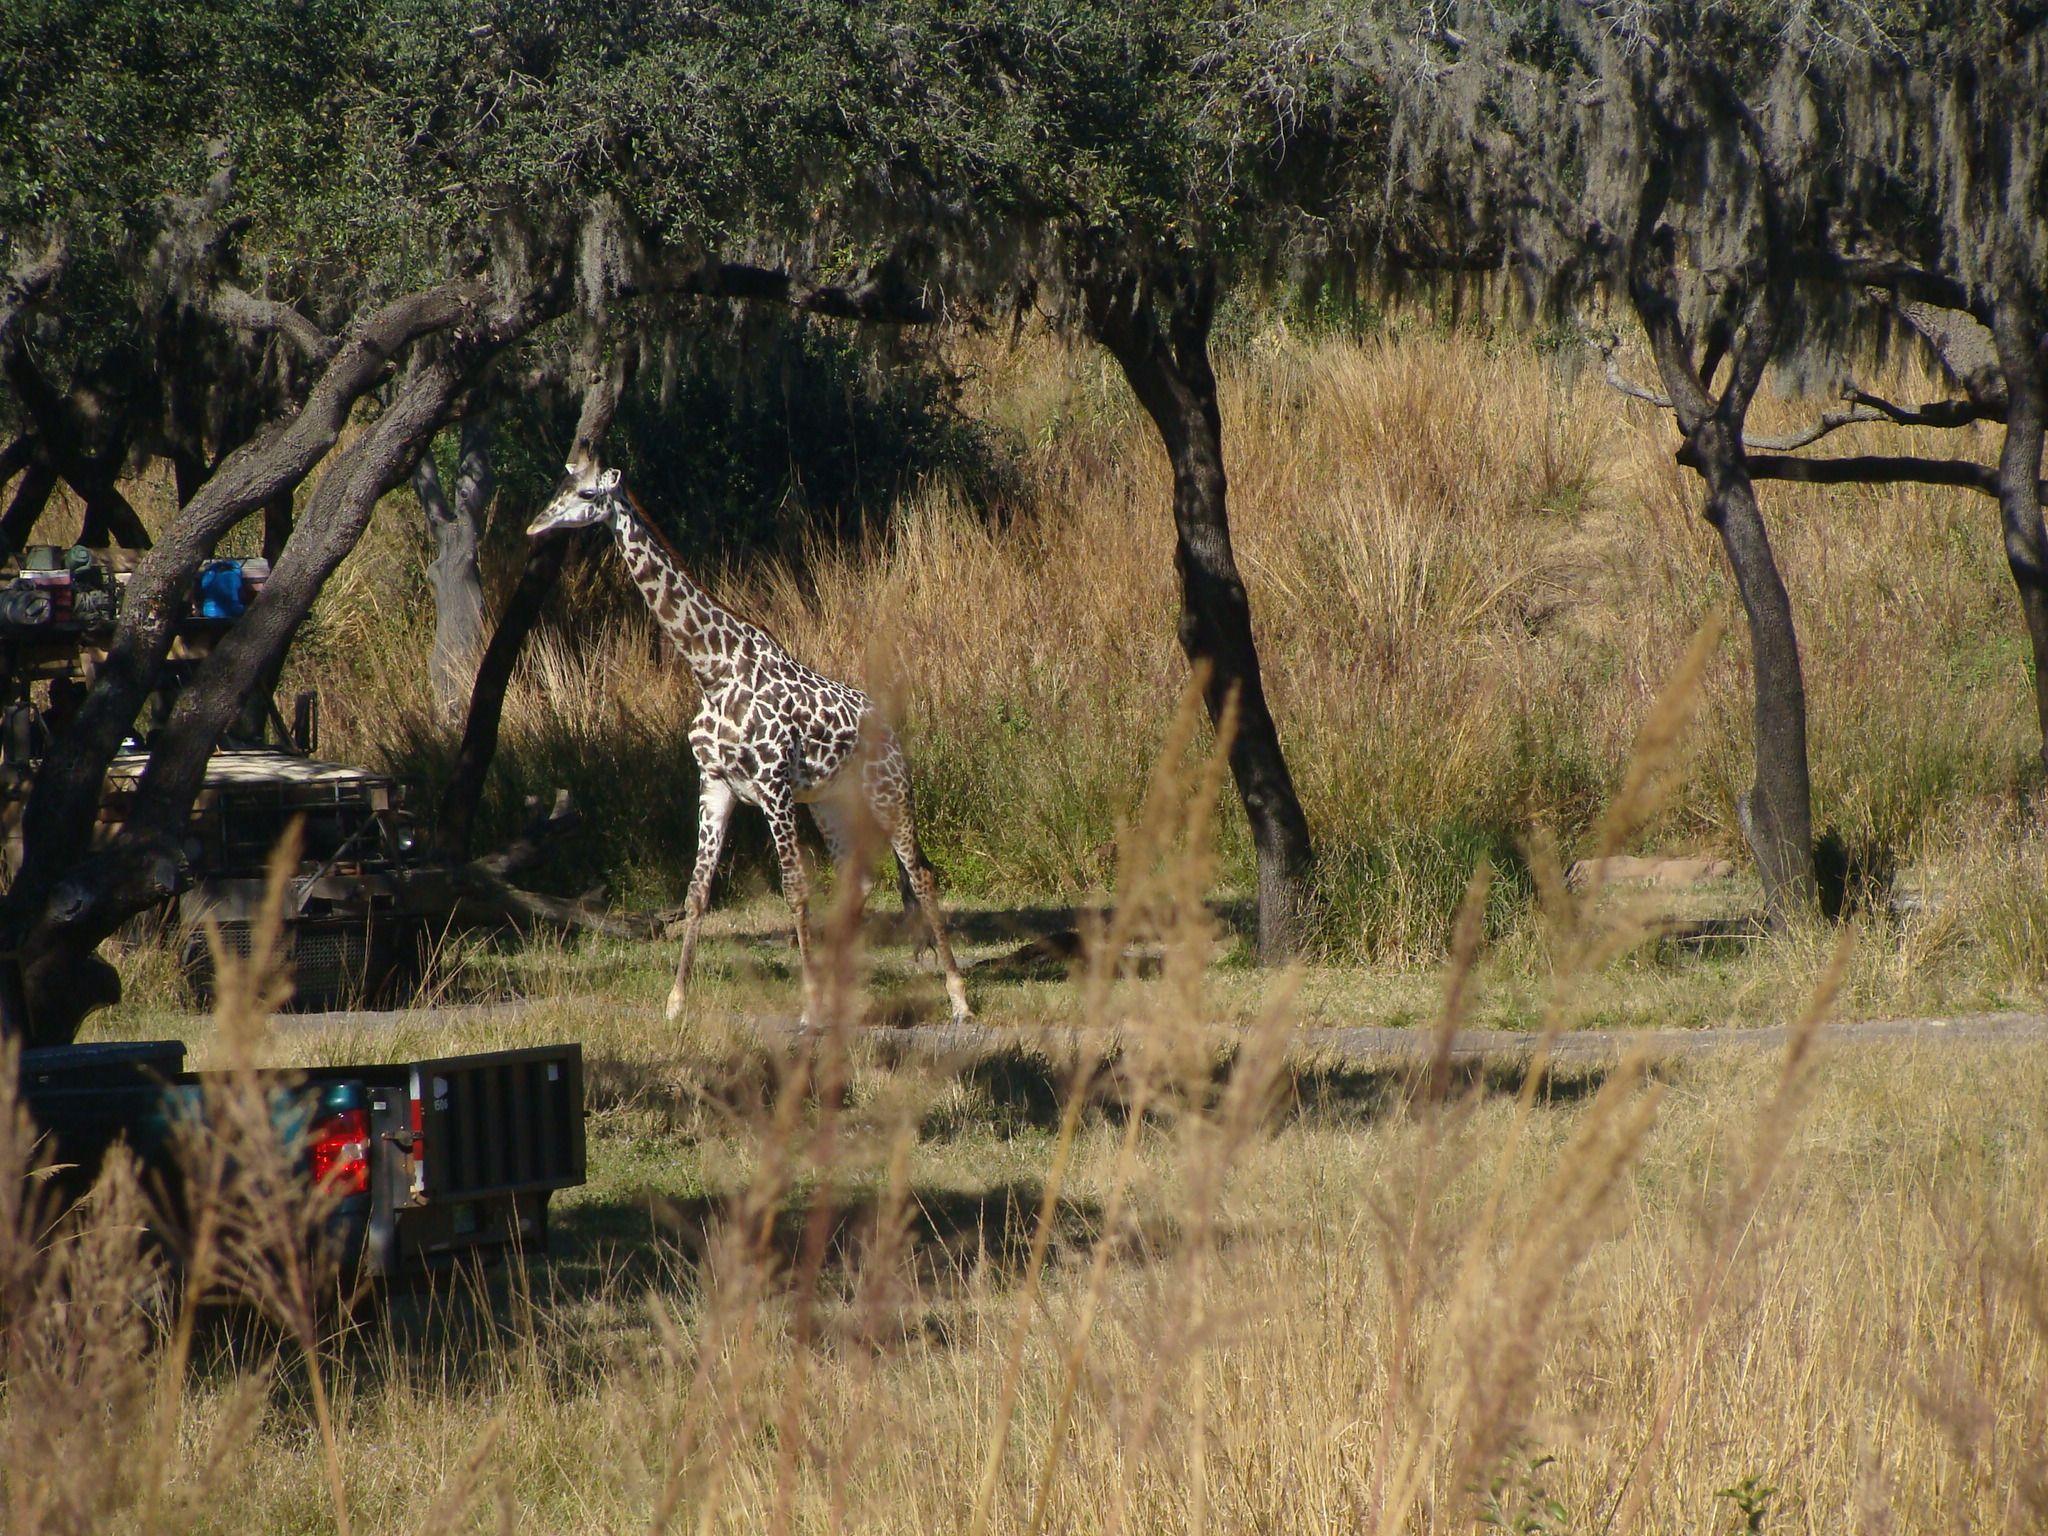 Giraffe on the savannah